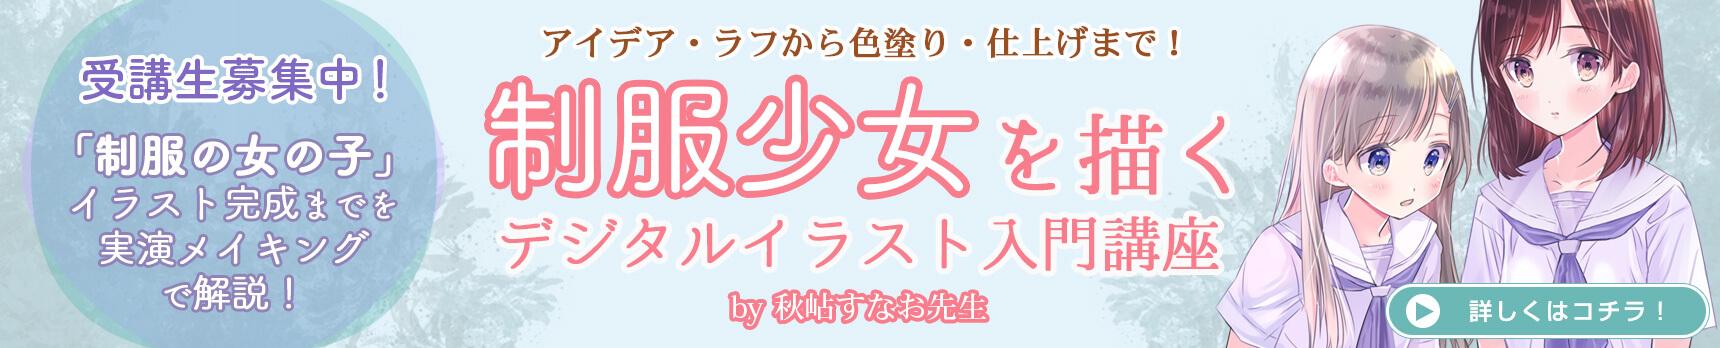 Akiyama banner pc